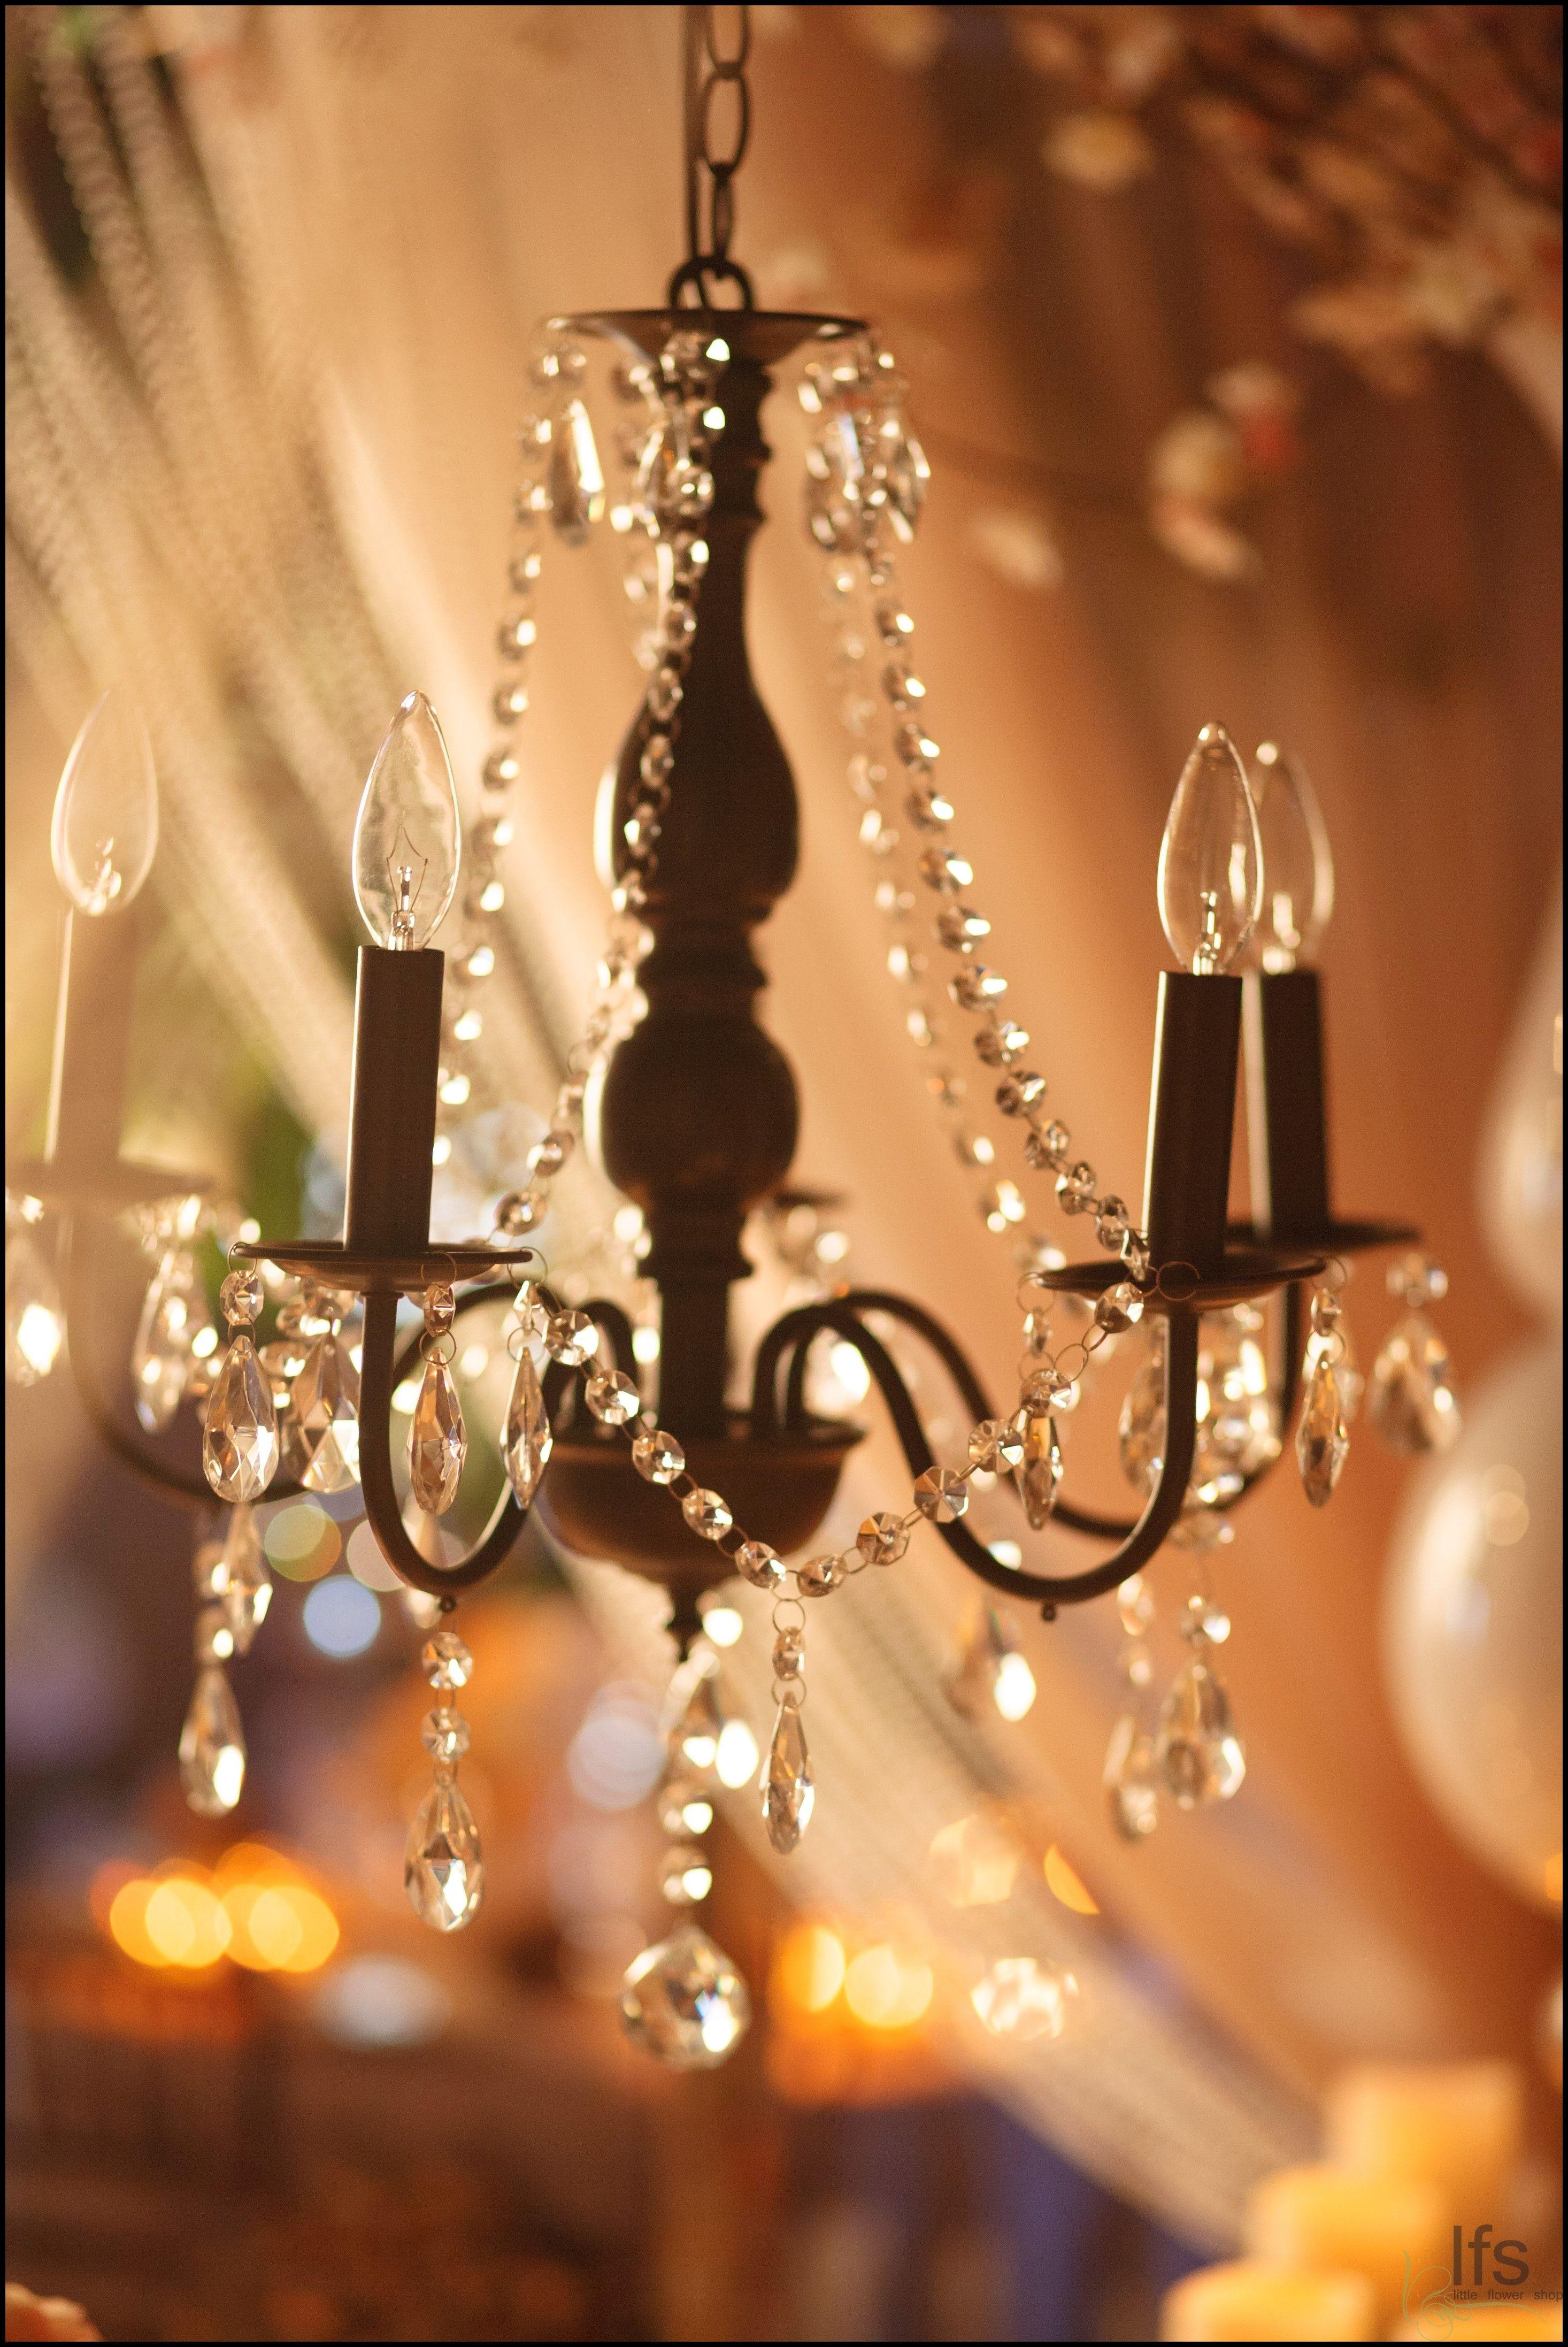 Little flower shop has a varied selection of chandeliers for wedding little flower shop has a varied selection of chandeliers for wedding rentals aloadofball Gallery